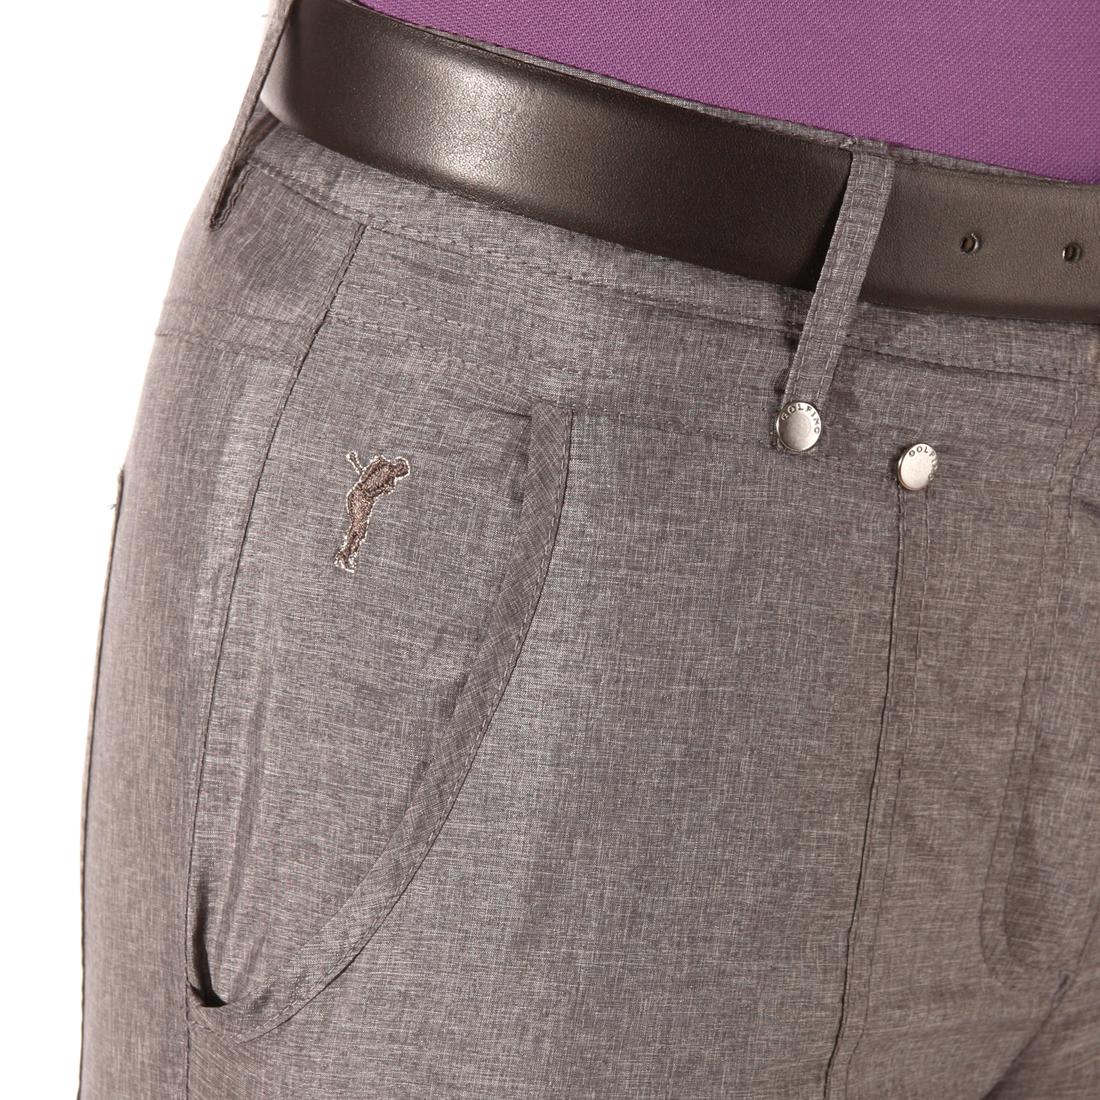 Damen Thermo Hose in Jeans-Optik